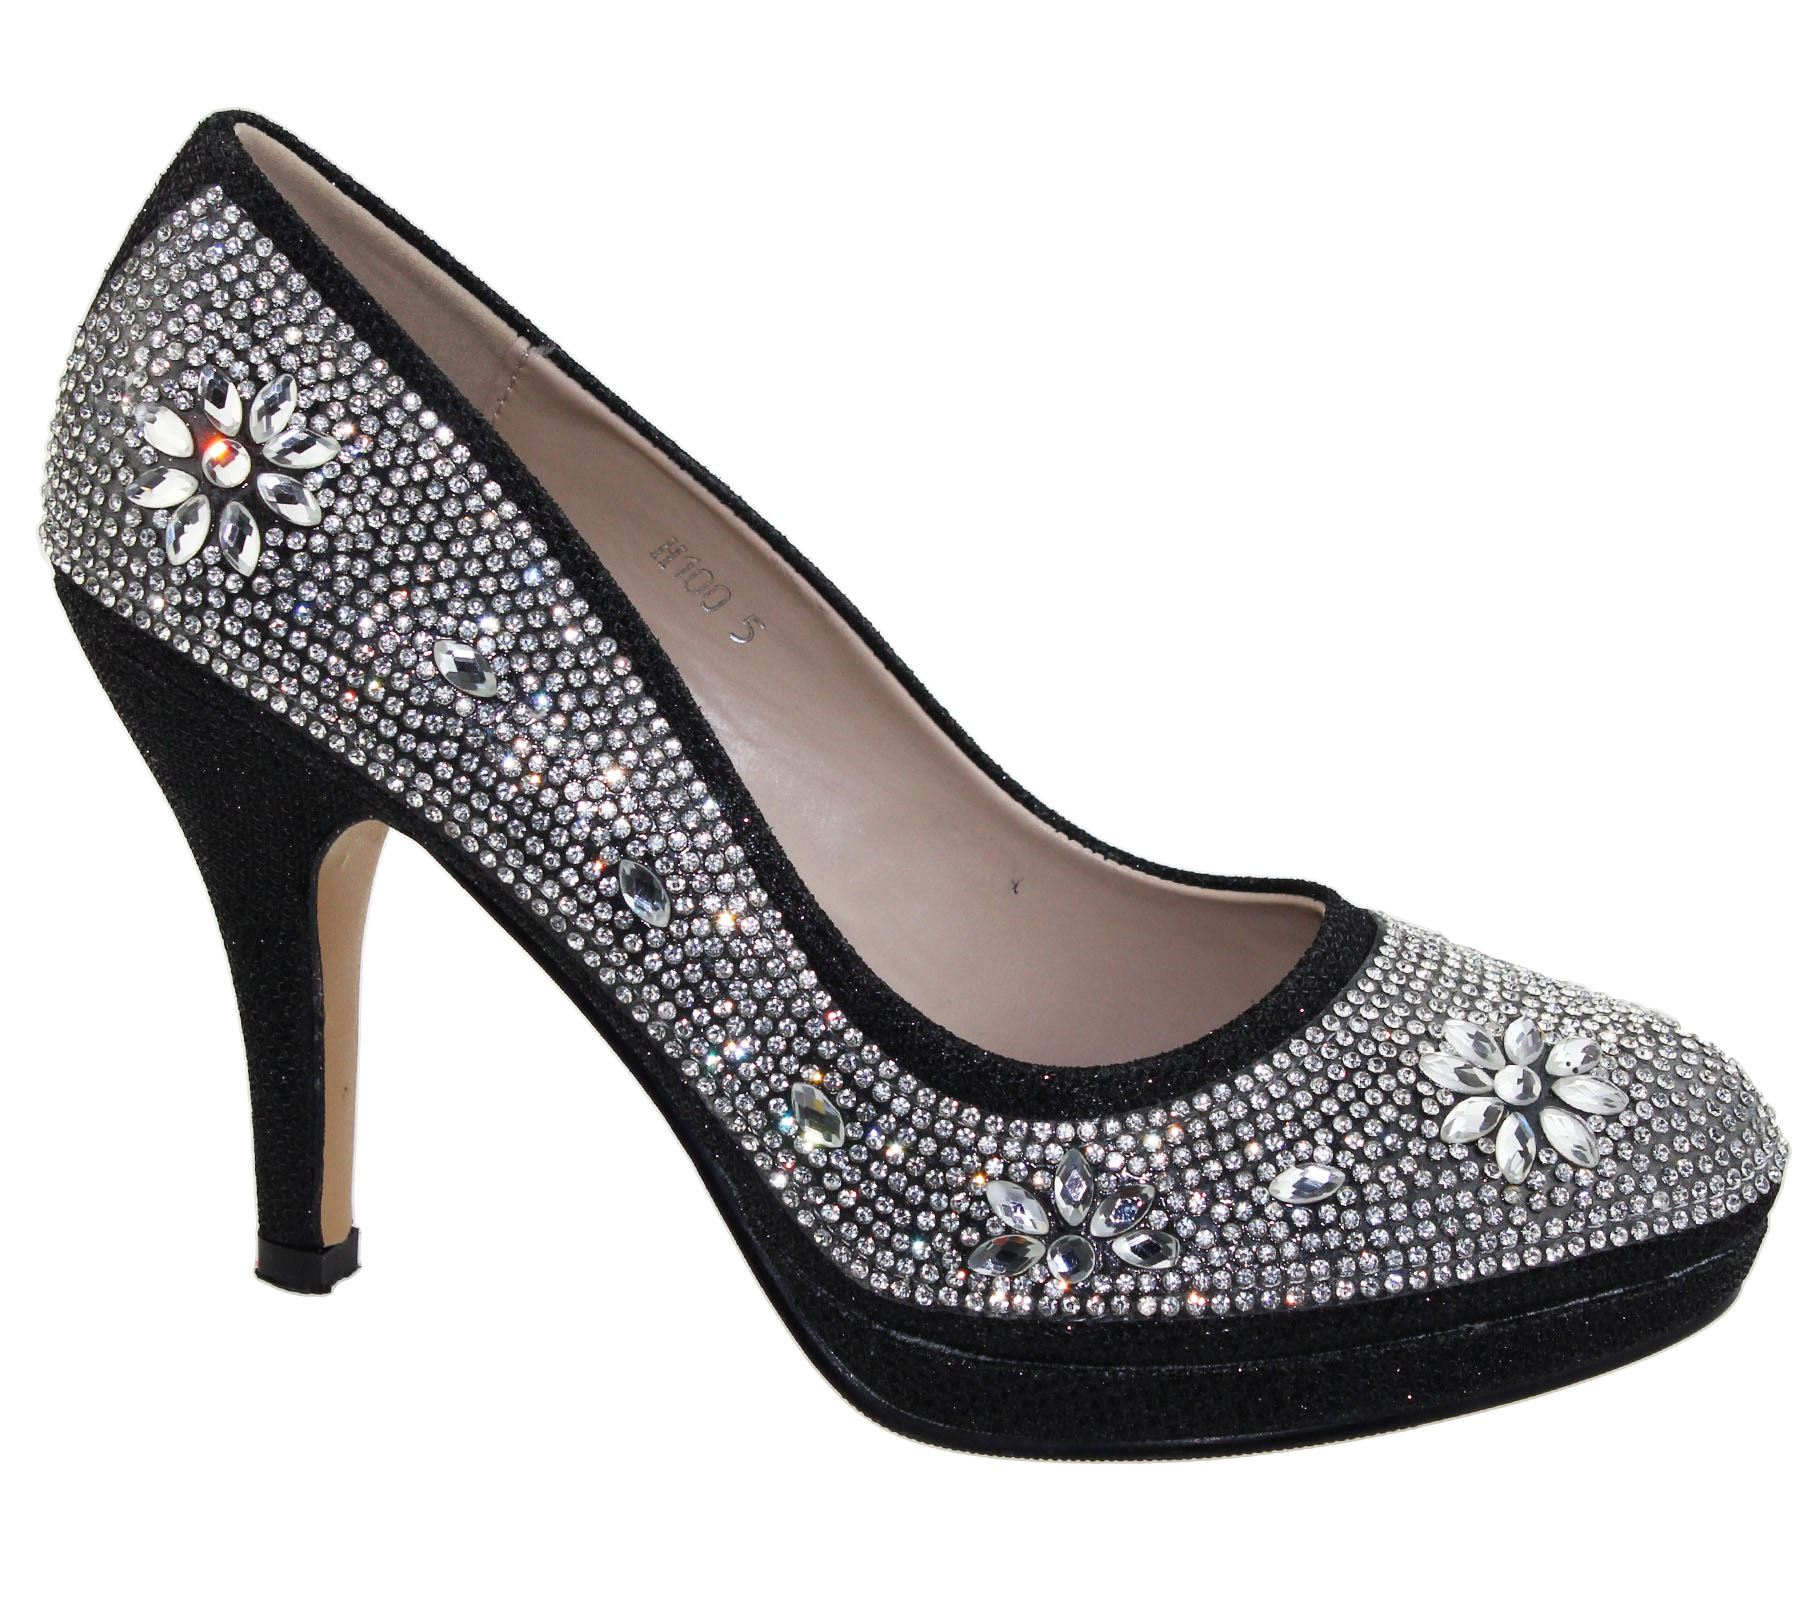 Wedding High Heels Sandals: Womens Platforms High Heels Wedding Bridal Evening